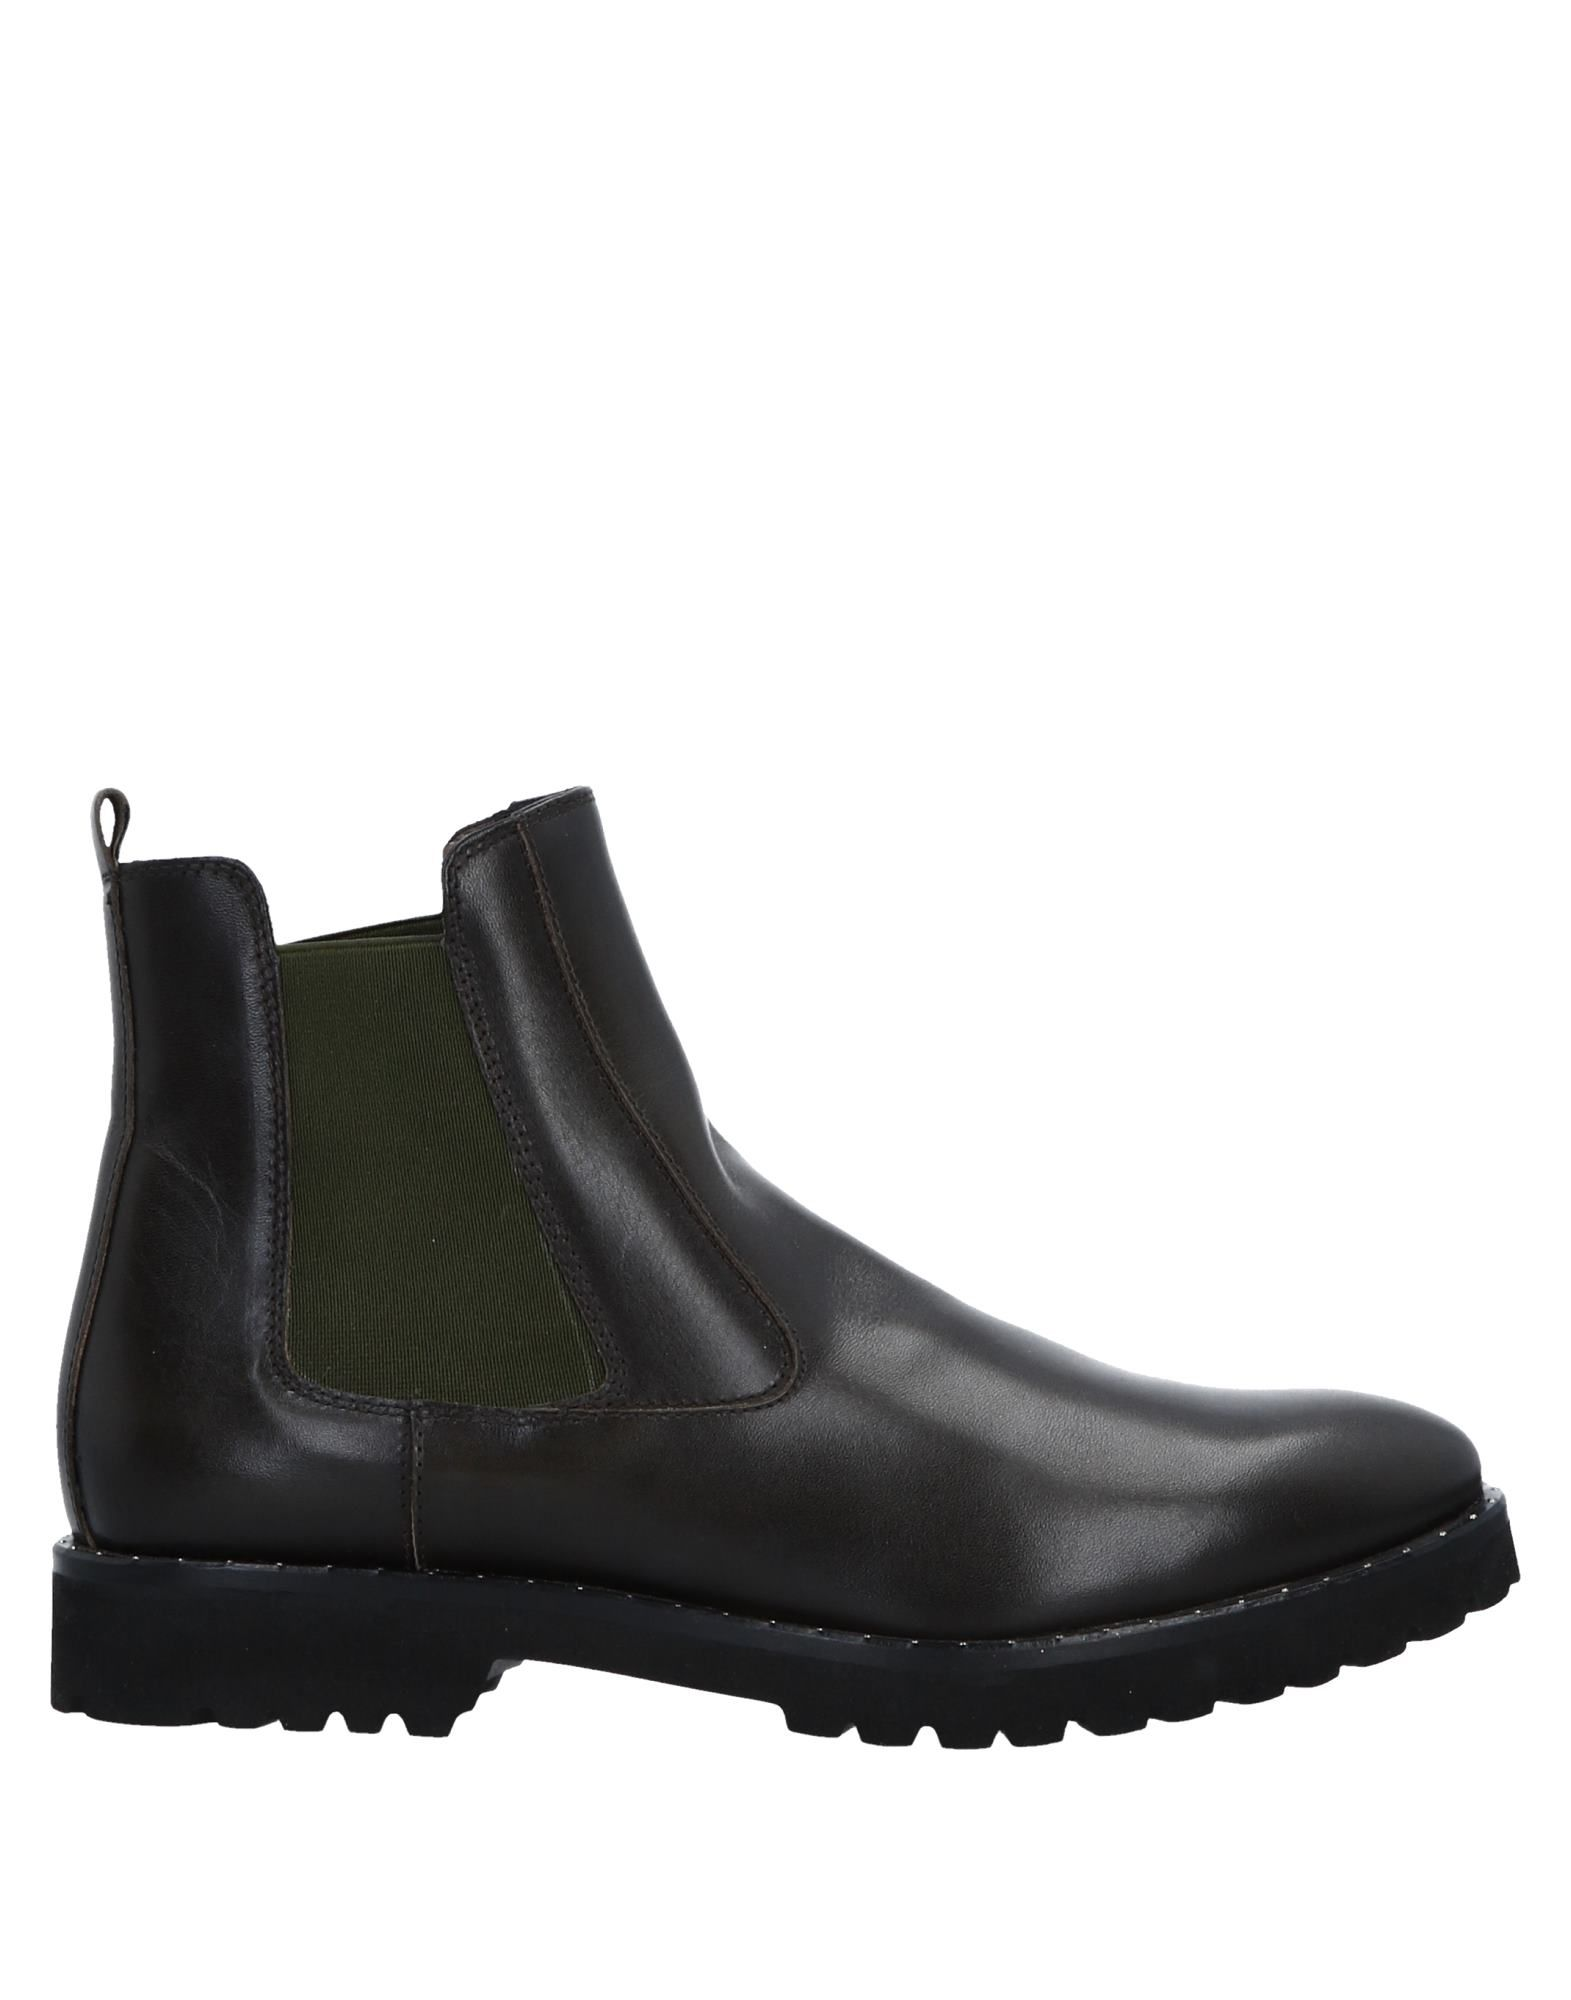 Settantatre Lr Chelsea Boots Damen Schuhe  11516148IFGut aussehende strapazierfähige Schuhe Damen de59e1